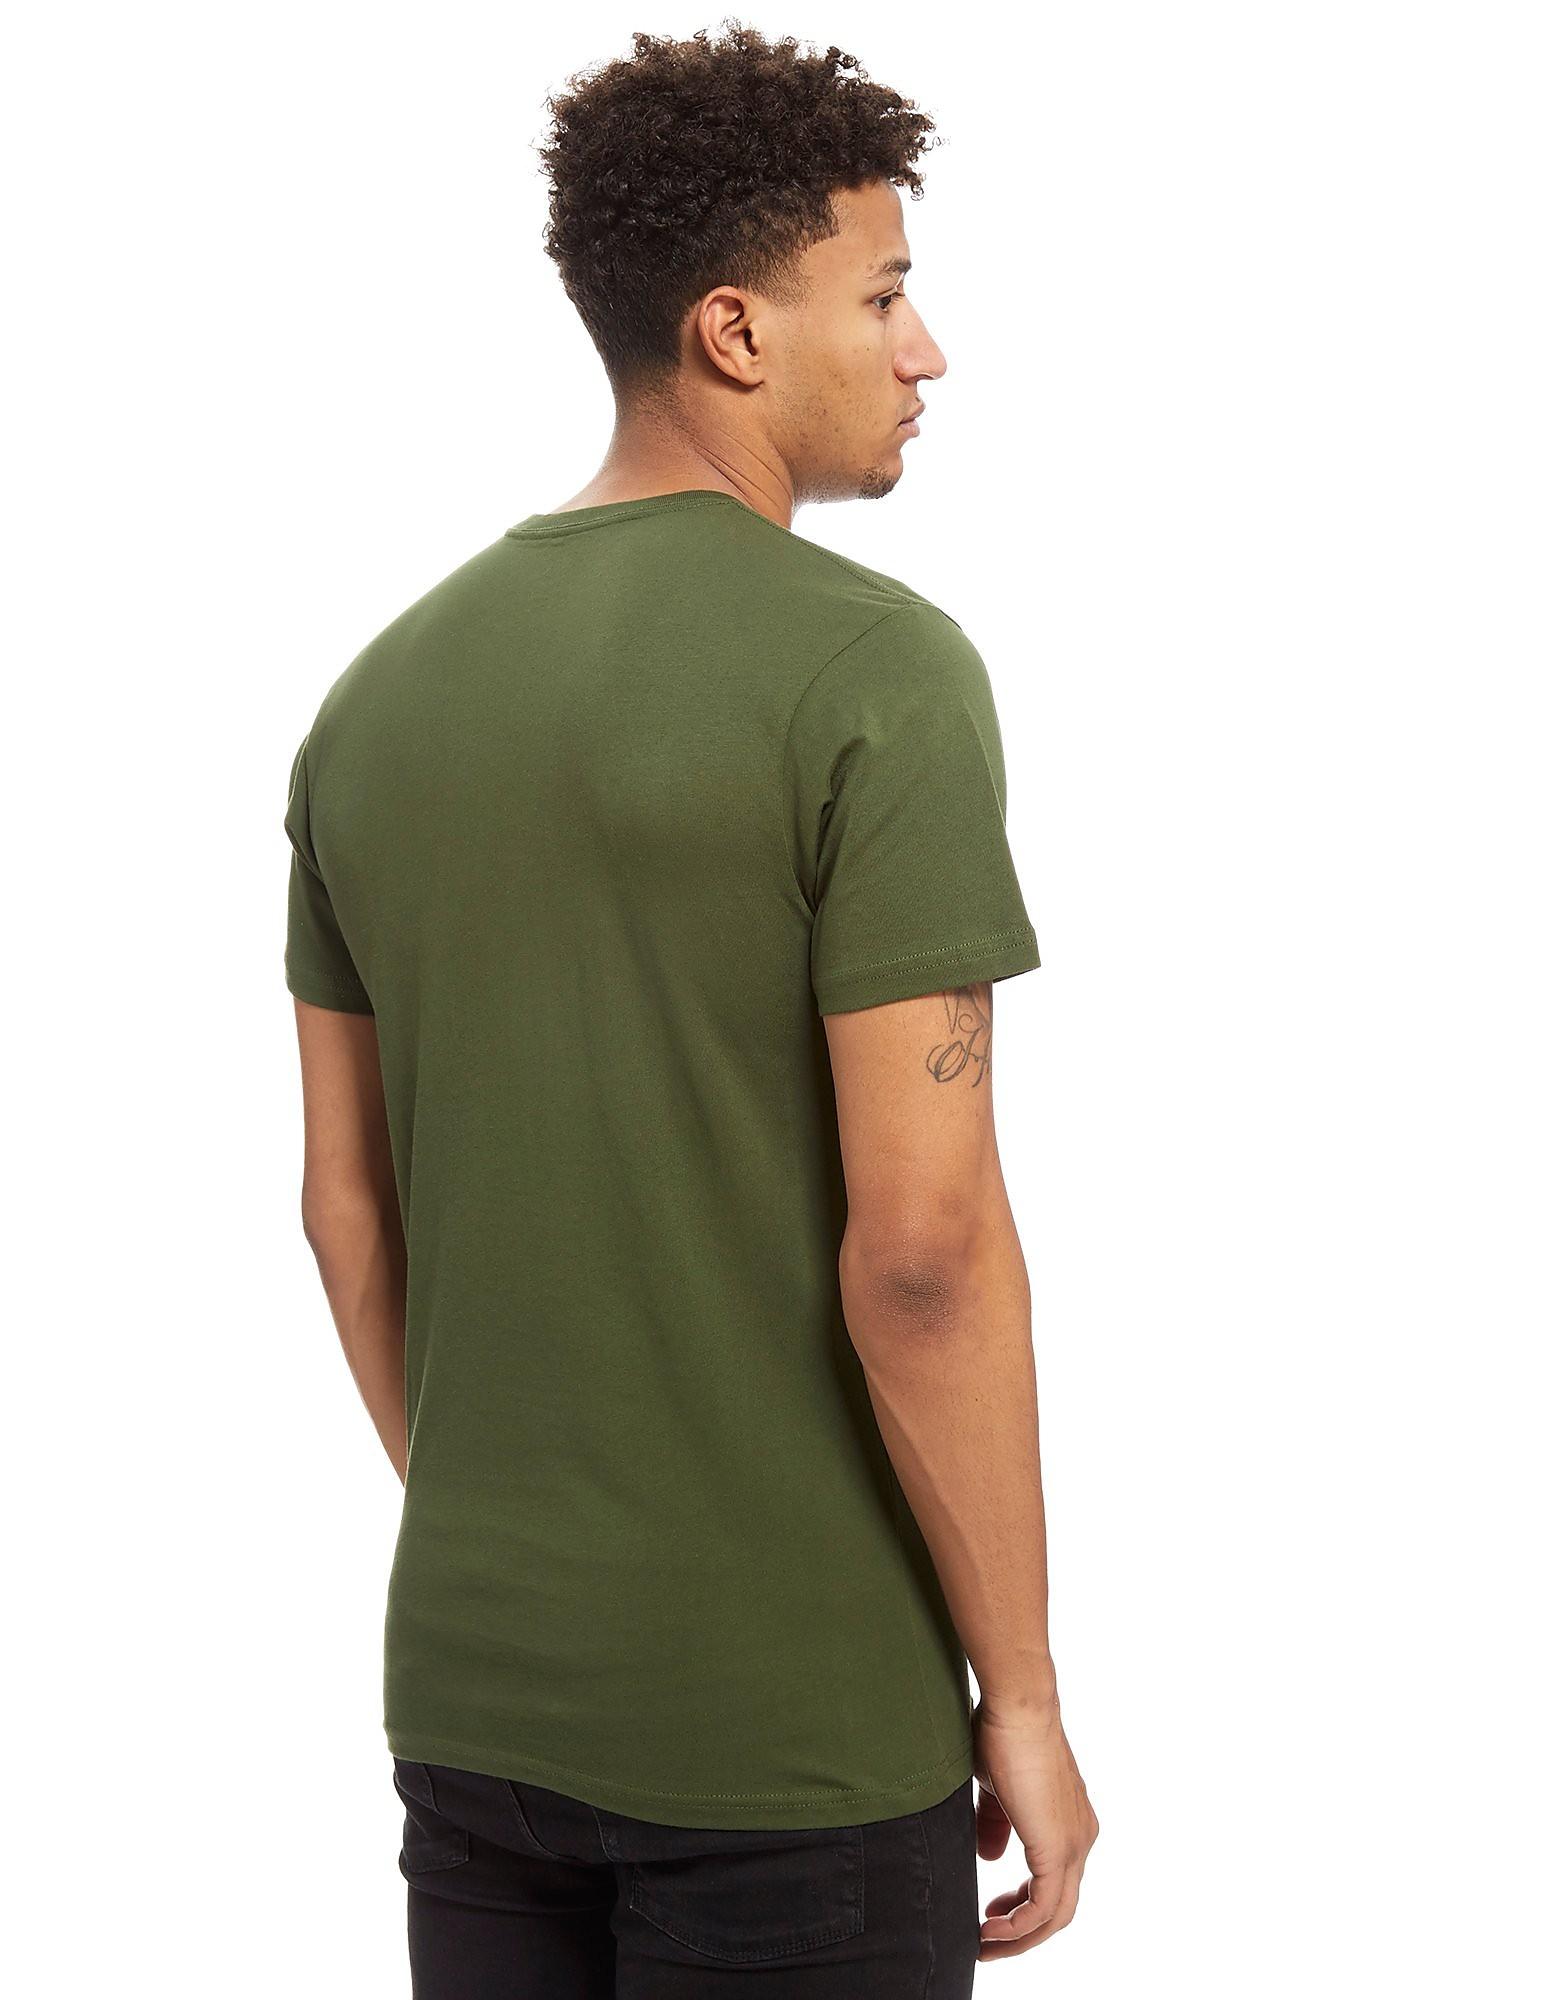 Vans camiseta Drop Box 66